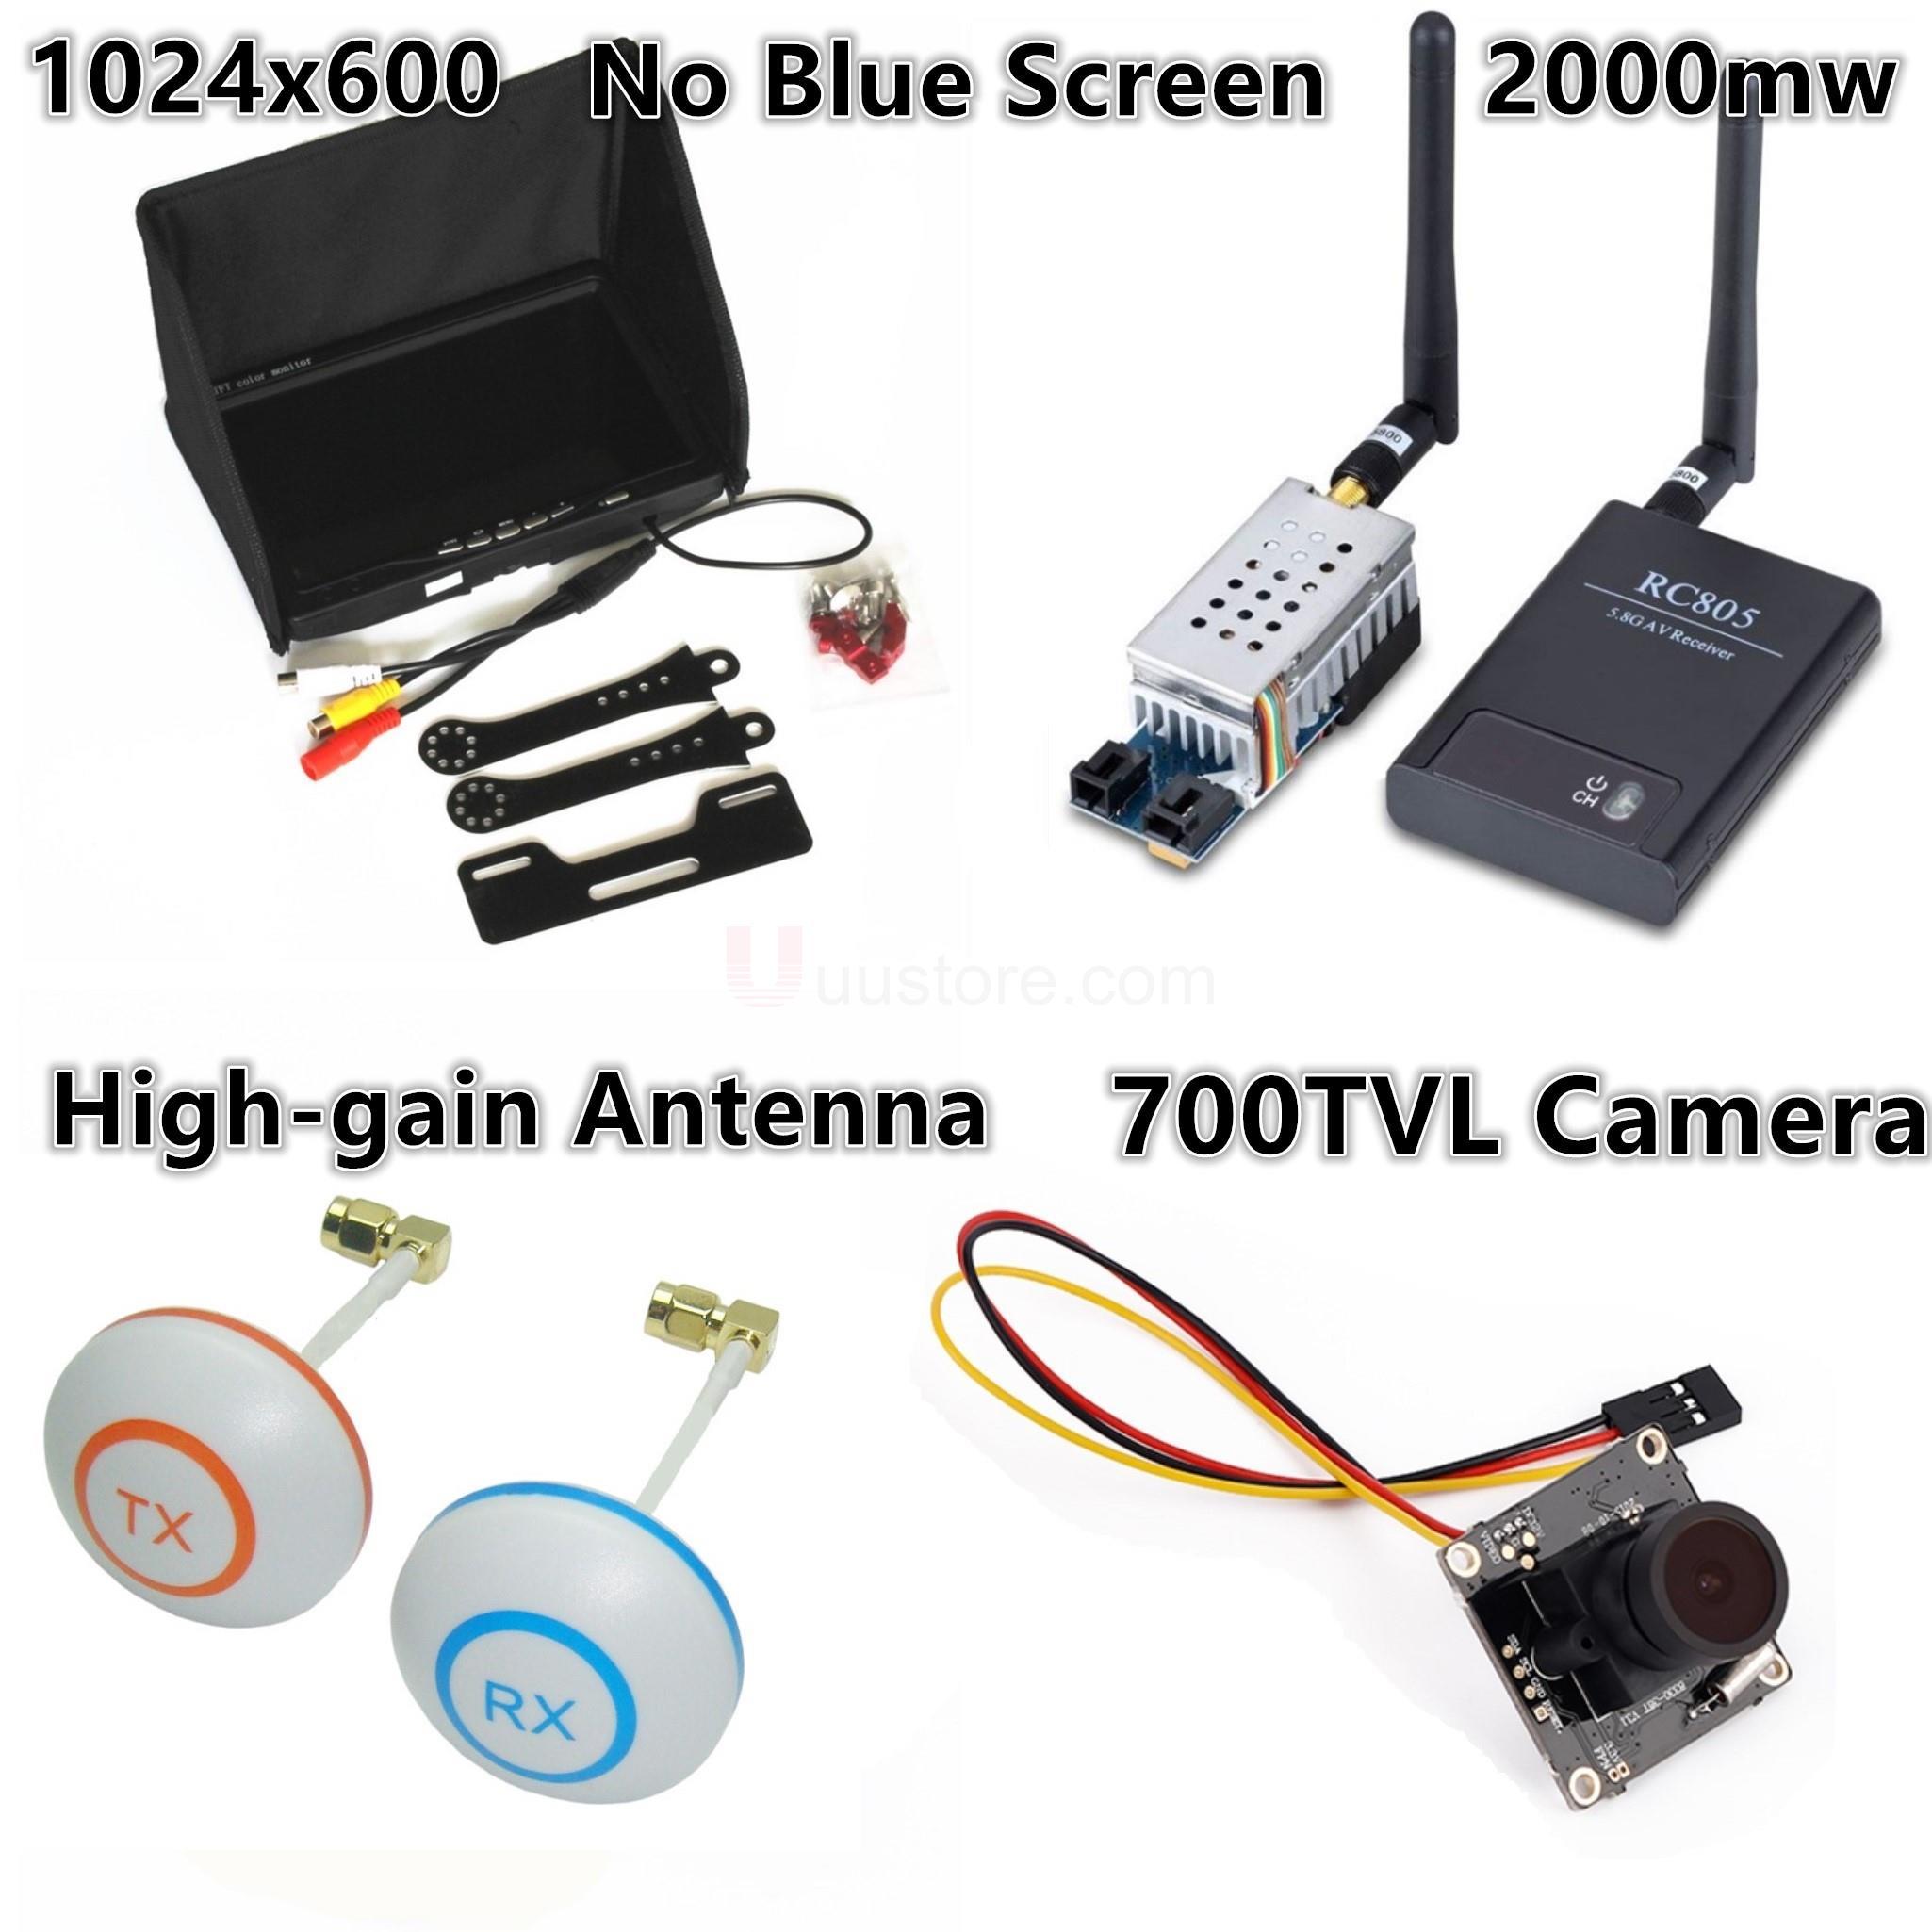 FPV Boscam комбо Системы 5,8 ГГц 5,8 Г 2000 МВт передатчик TS582000 TX RC805 приемник RX 1024x600 монитор 700TVL Камера для Drone